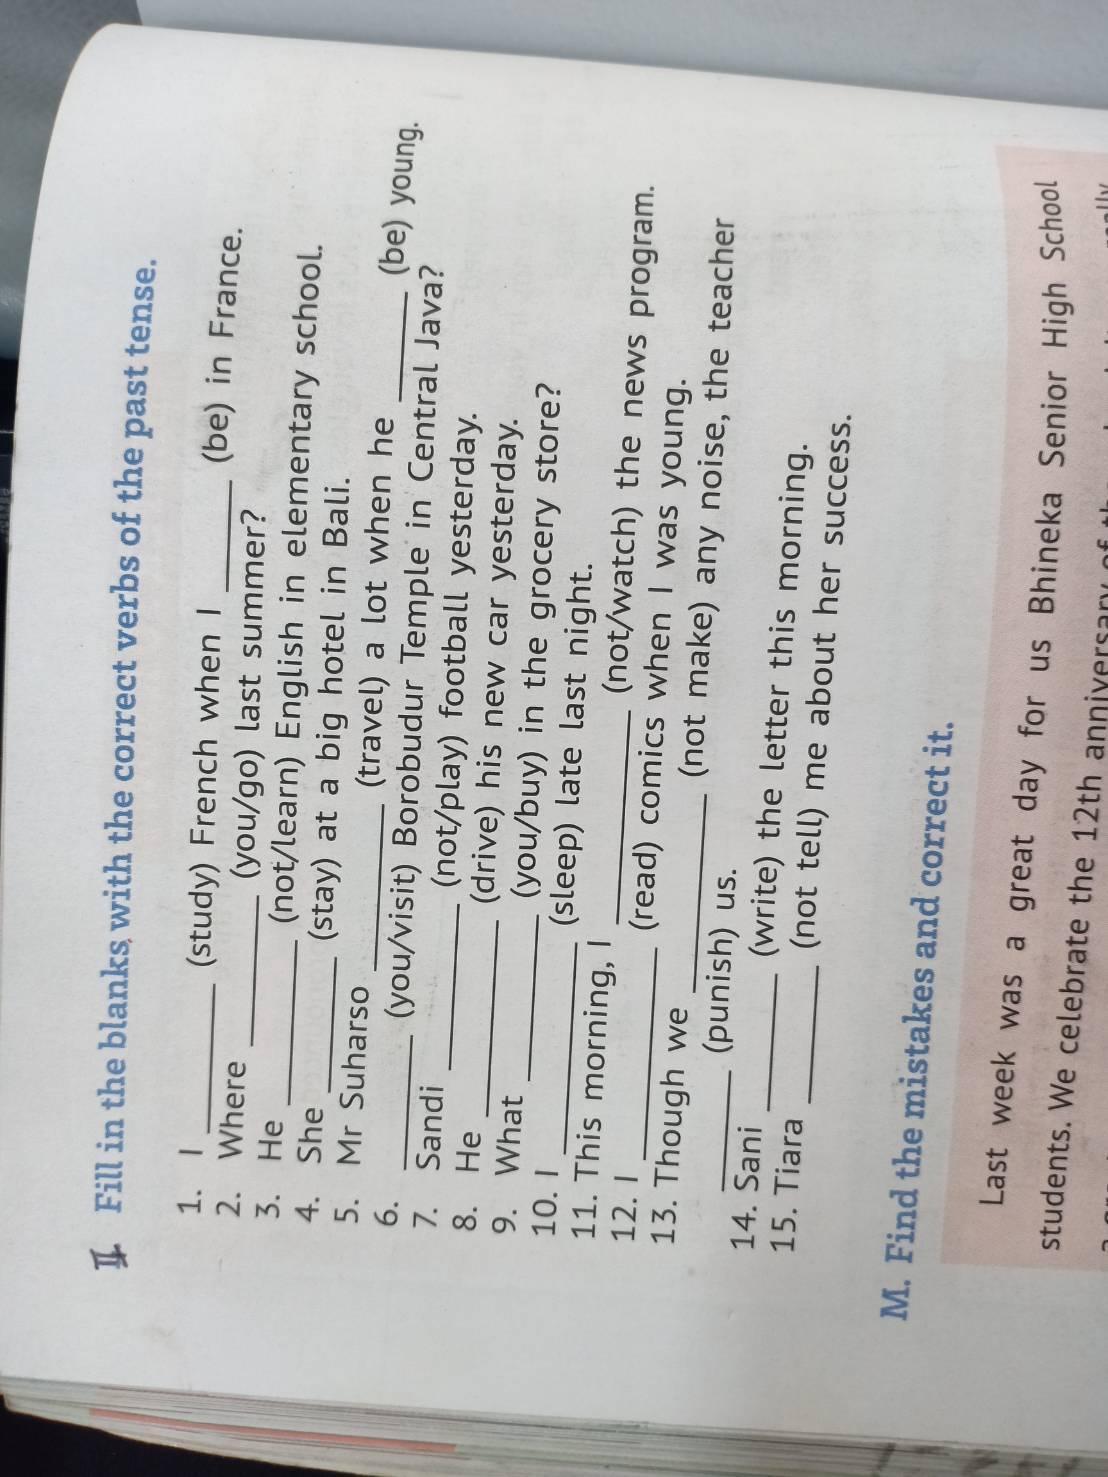 45 Point Jawab Lengkap Ya Brainly Co Id